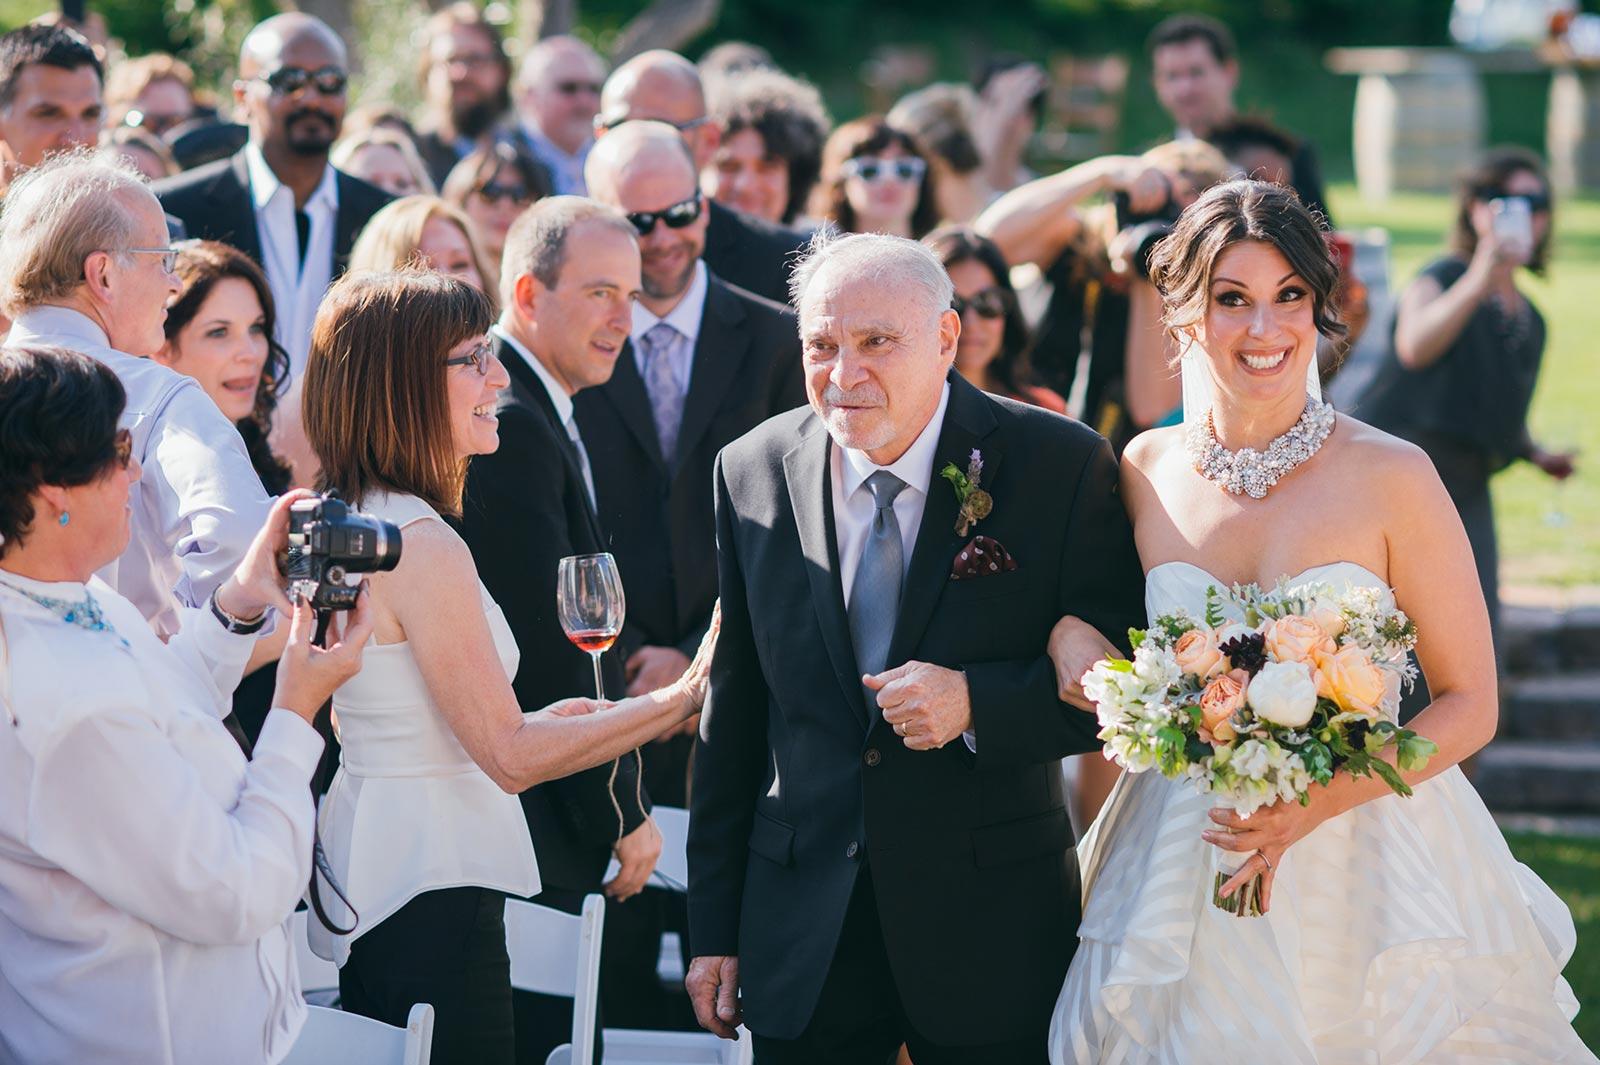 Santa Margarita Ranch Wedding Joe Lo Truglio And Beth Orton Bluephoto Wedding Photographer